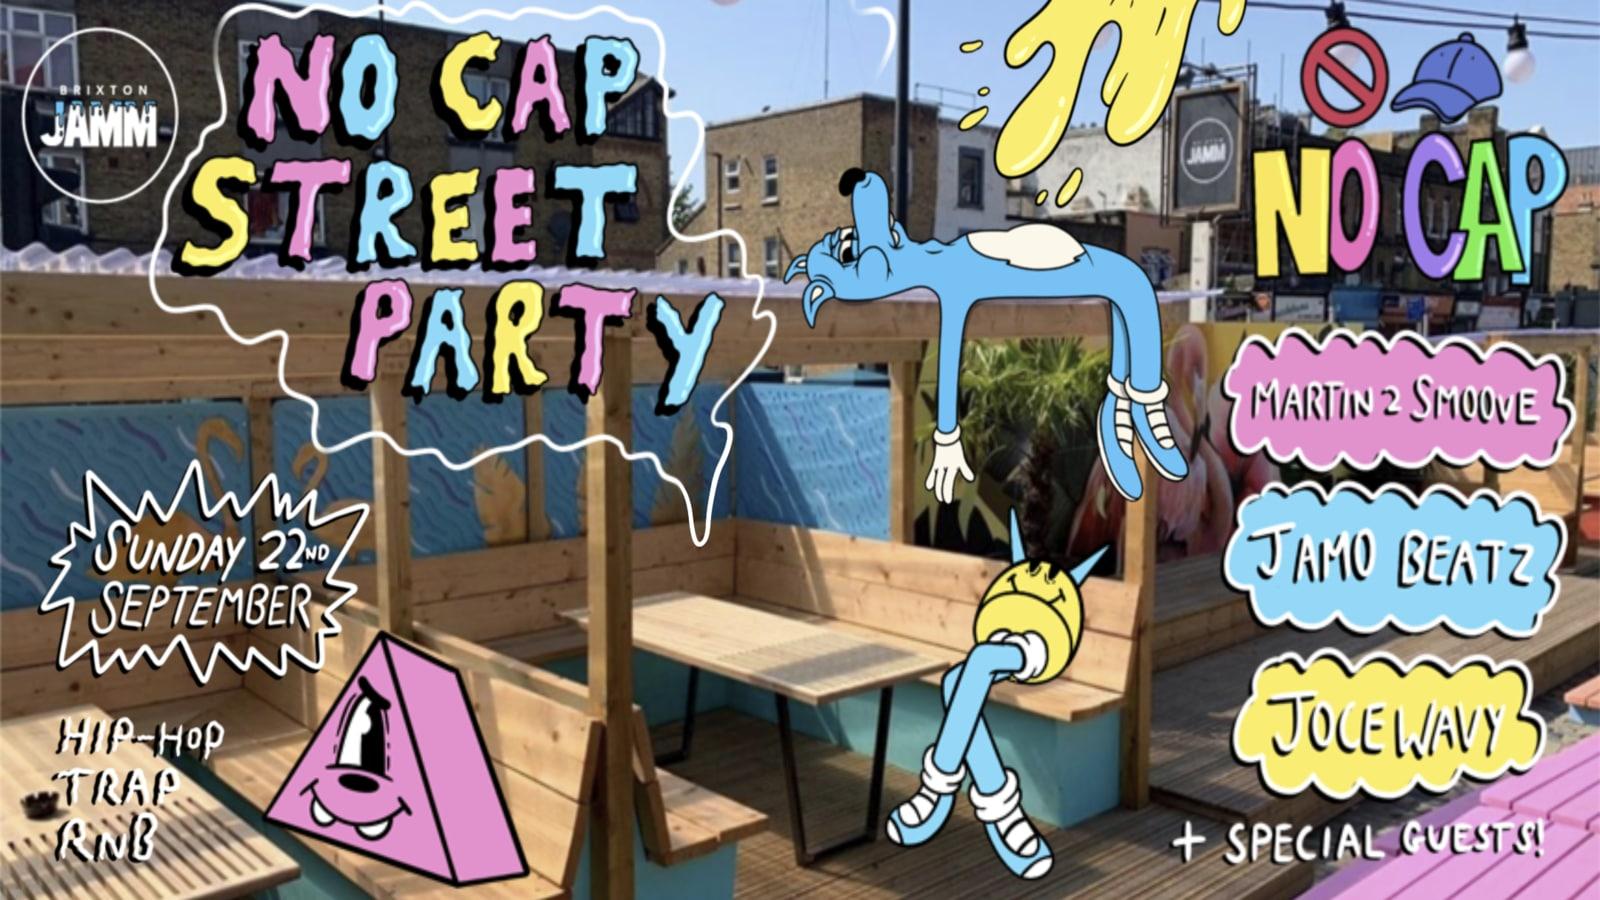 NO CAP STREET PARTY @BRIXTON JAM – JERK BBQ/STREET FOOD IN THE GARDEN!! RUM SHOTS ALL DAY LONG!!!